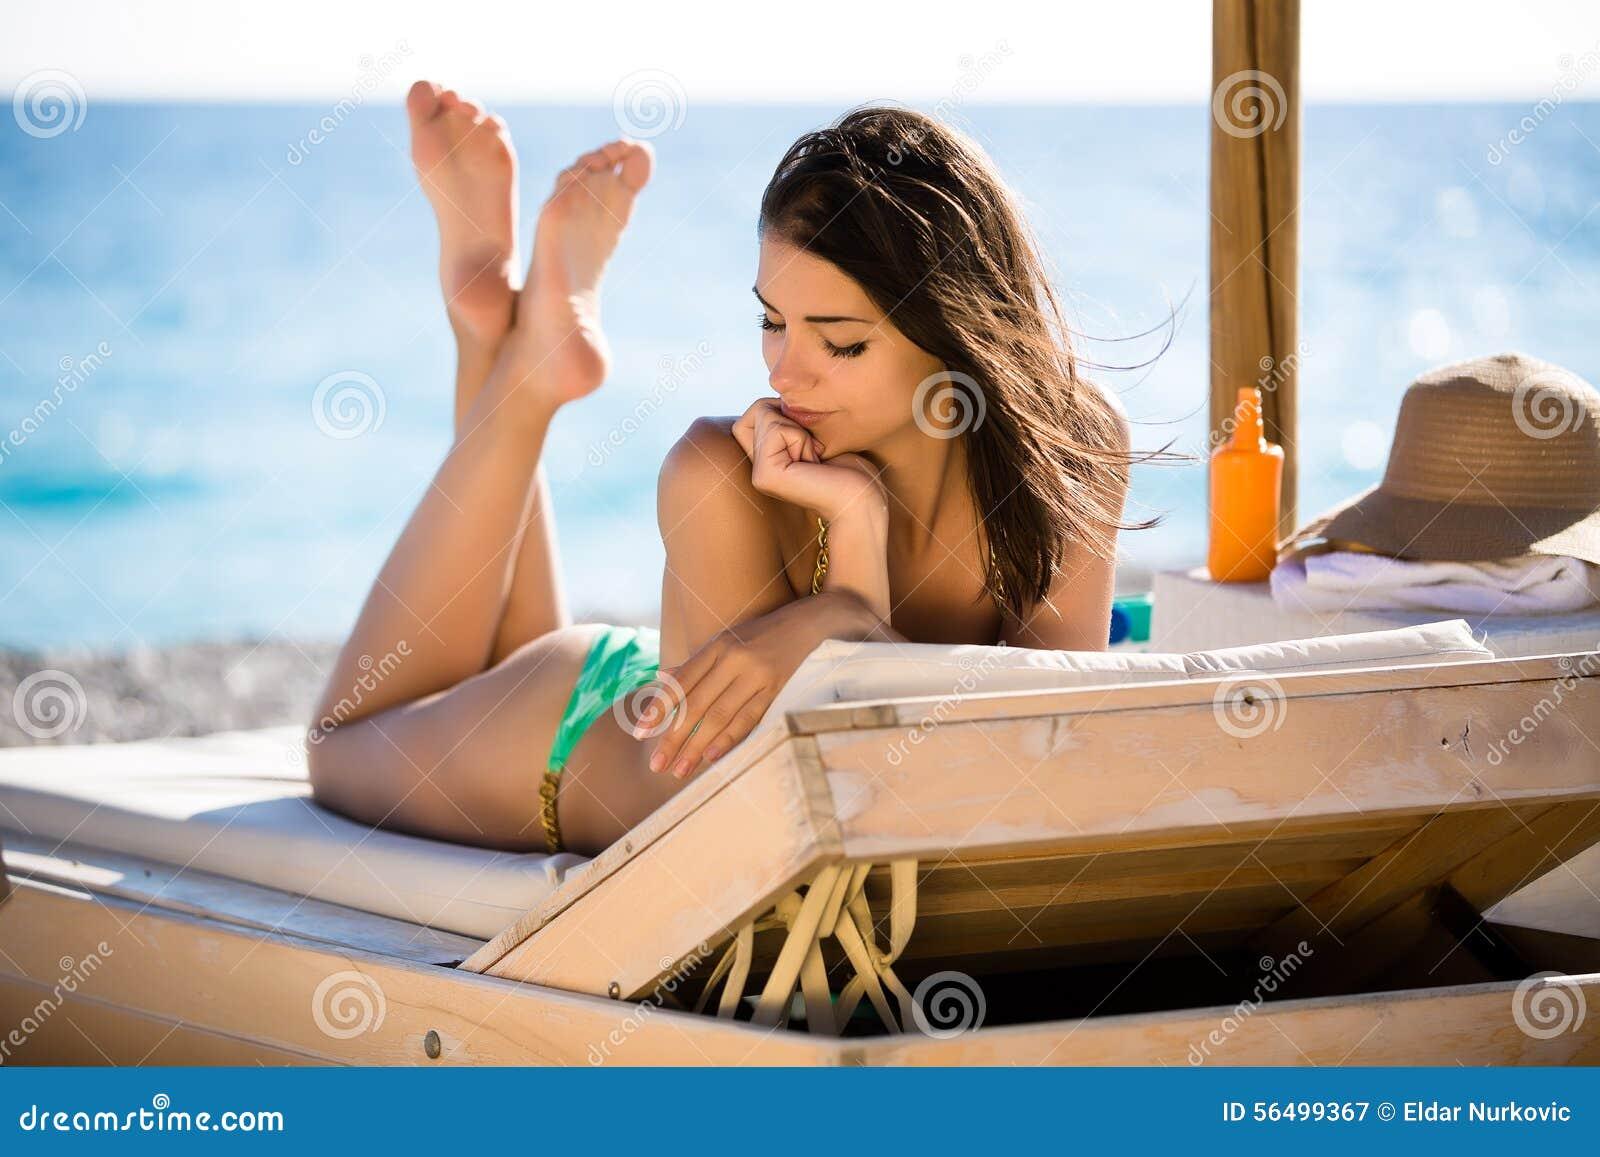 Smiling beautiful woman sunbathing in a bikini on a beach at tropical travel resort,enjoying summer holidays.Young woman lying on